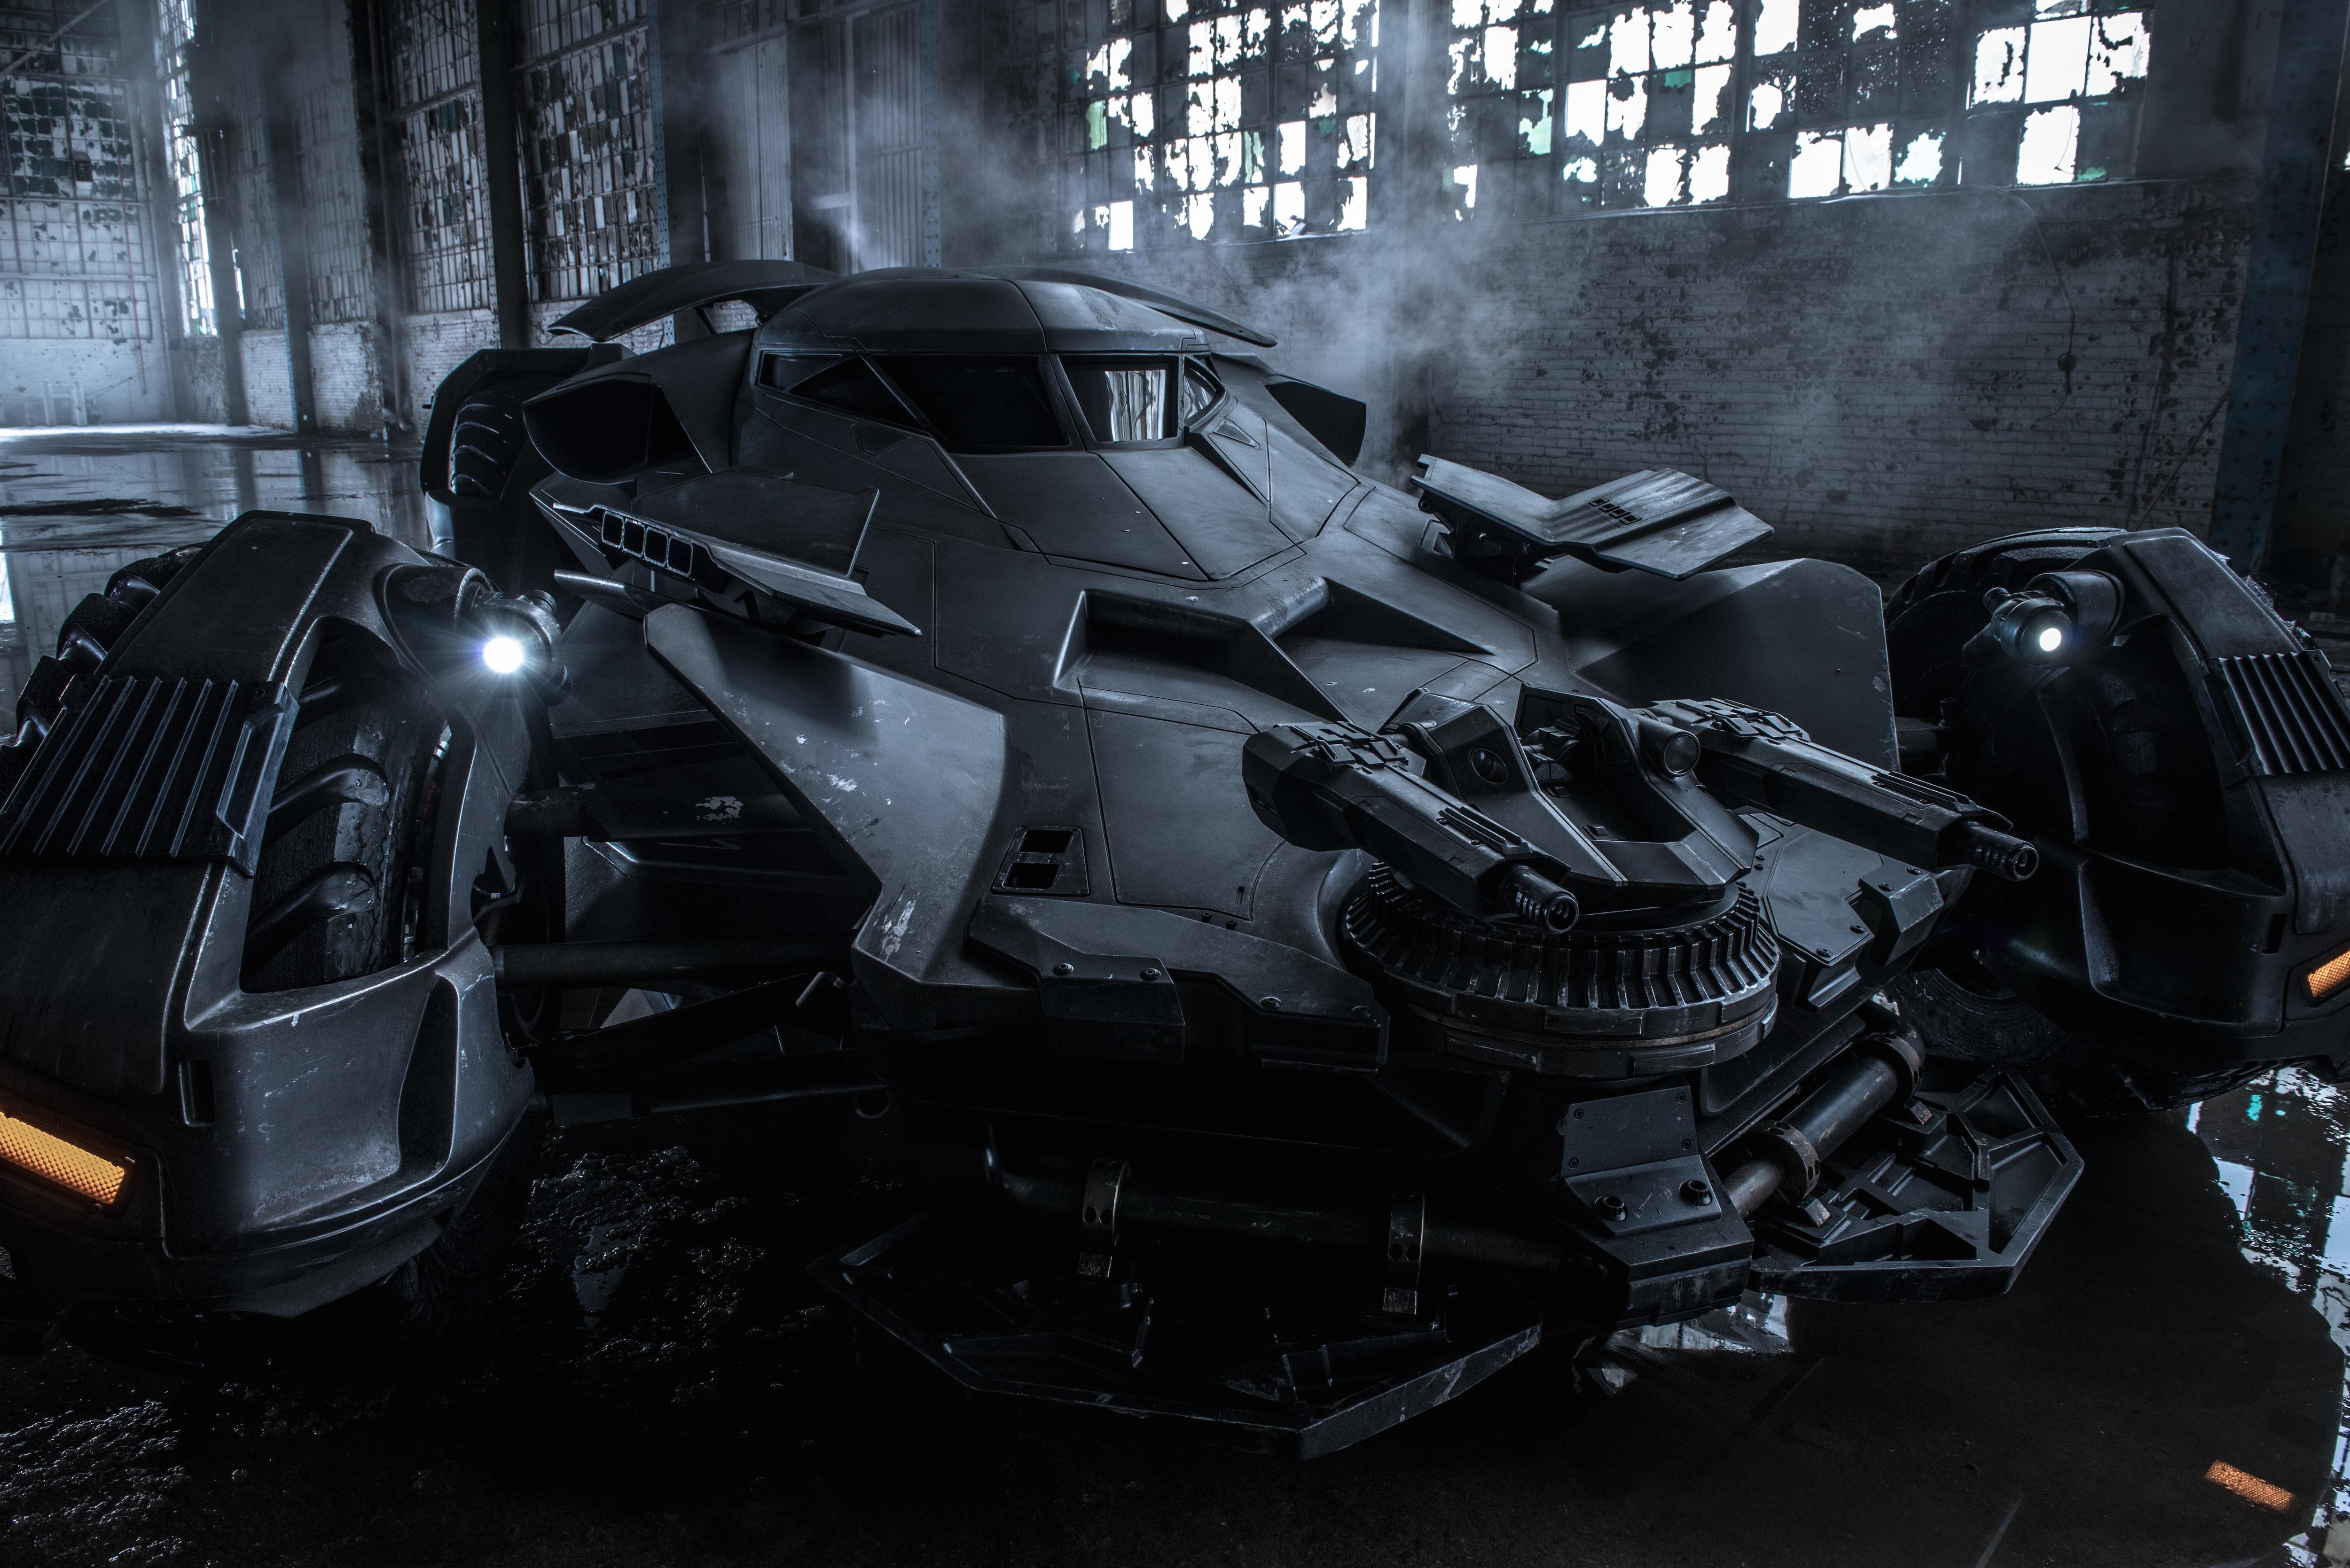 Batman Vs Superman : Dawn Of Justice (23 mars 2016) FU8cajM1